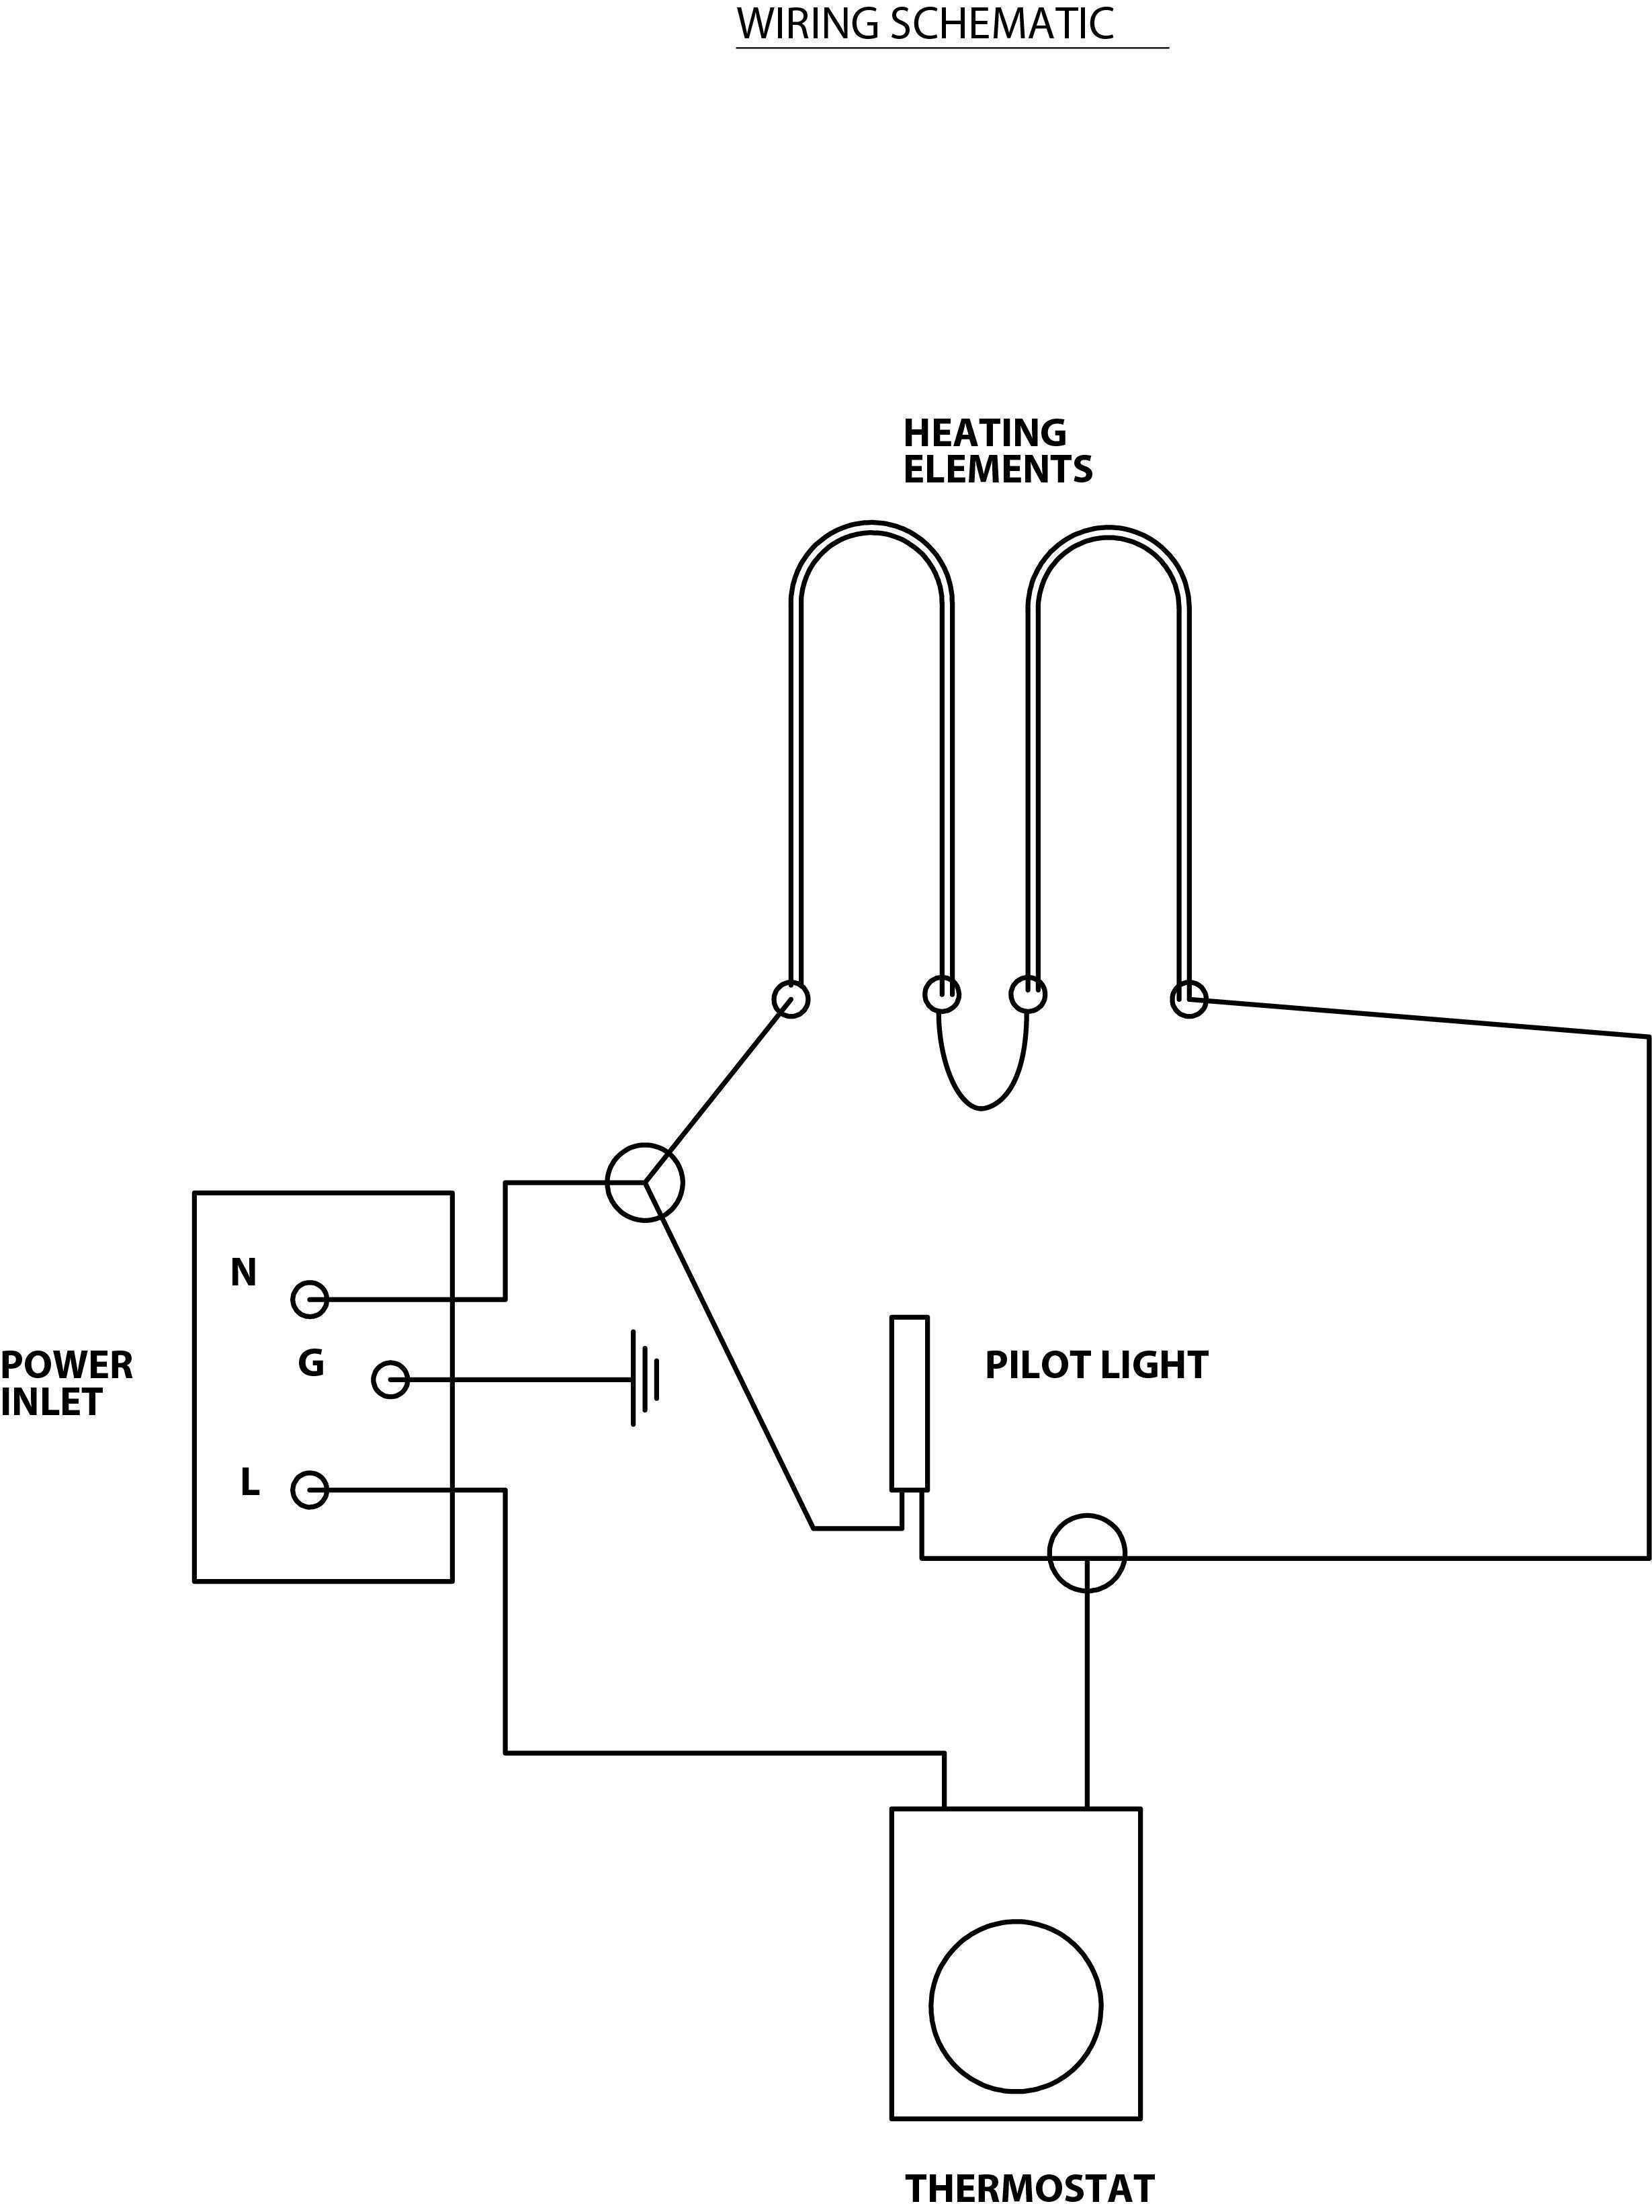 Leeson 3 Phase Motor Wiring Diagram Terminals P | Wiring Diagram - Leeson Motor Wiring Diagram